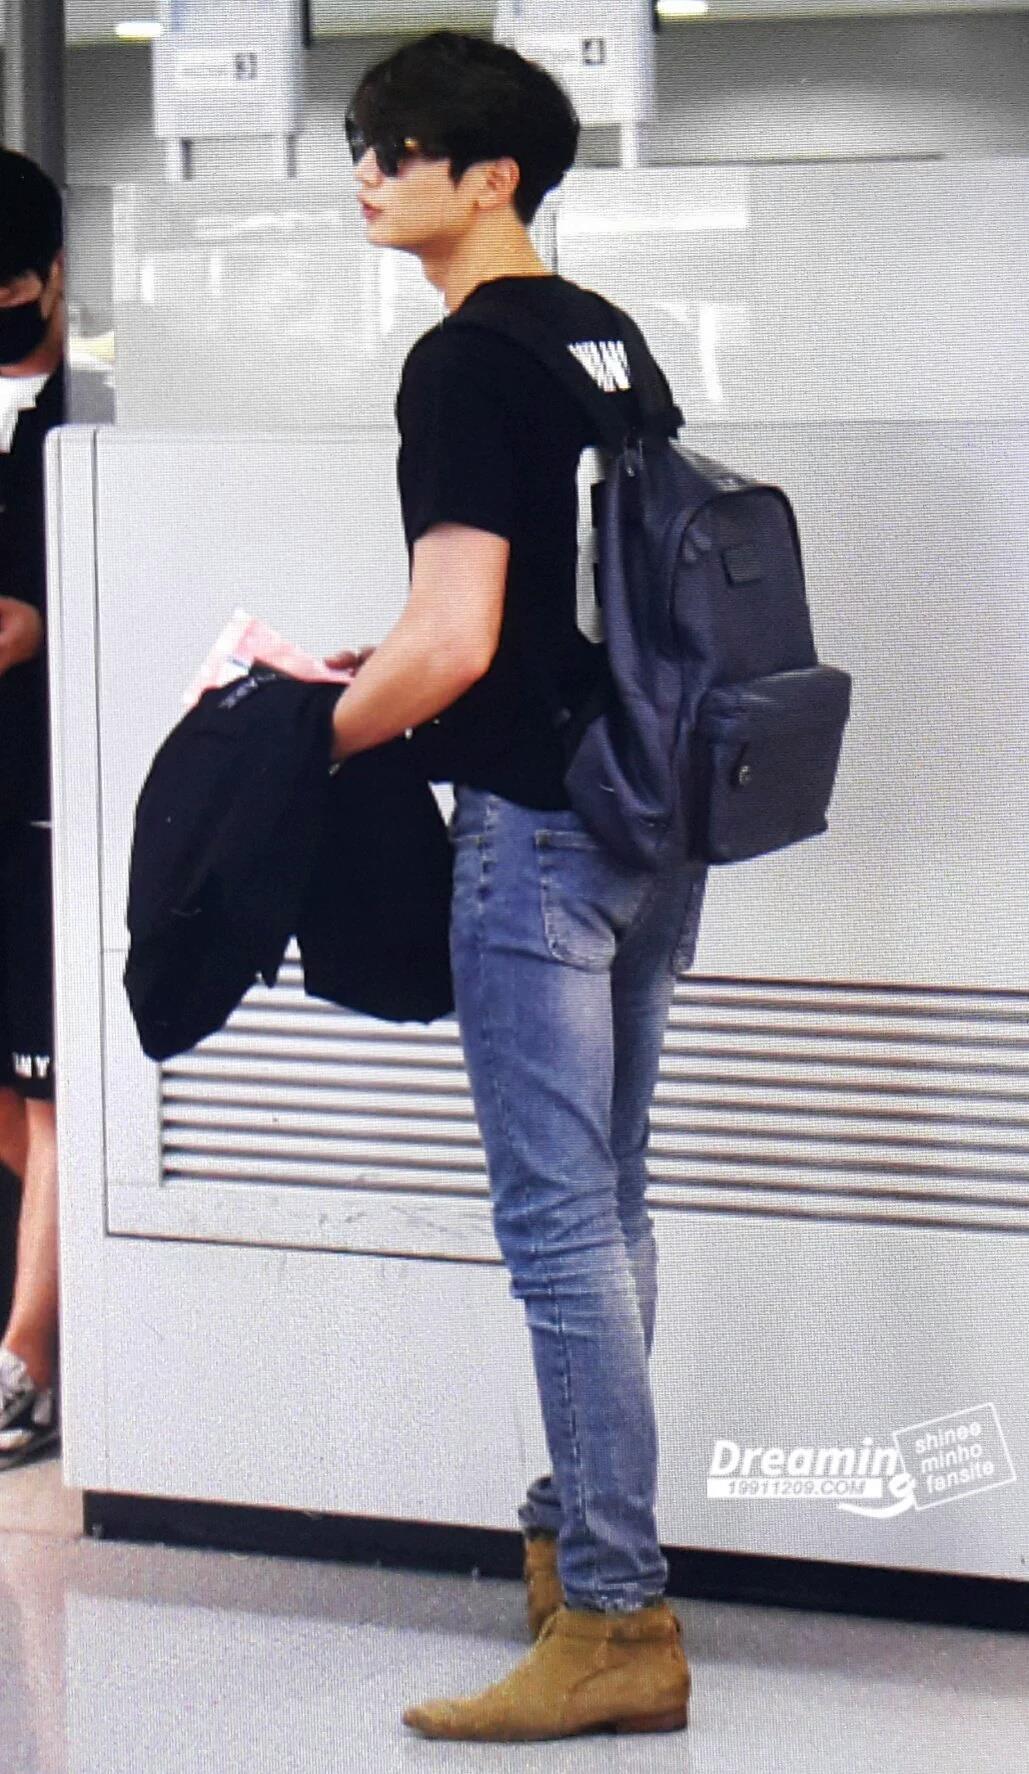 [IMG/160718] Onew, Jonghyun, Key, Minho @Aeropuerto de Kansai e Incheon (Jap-Cor) TgswbnIU